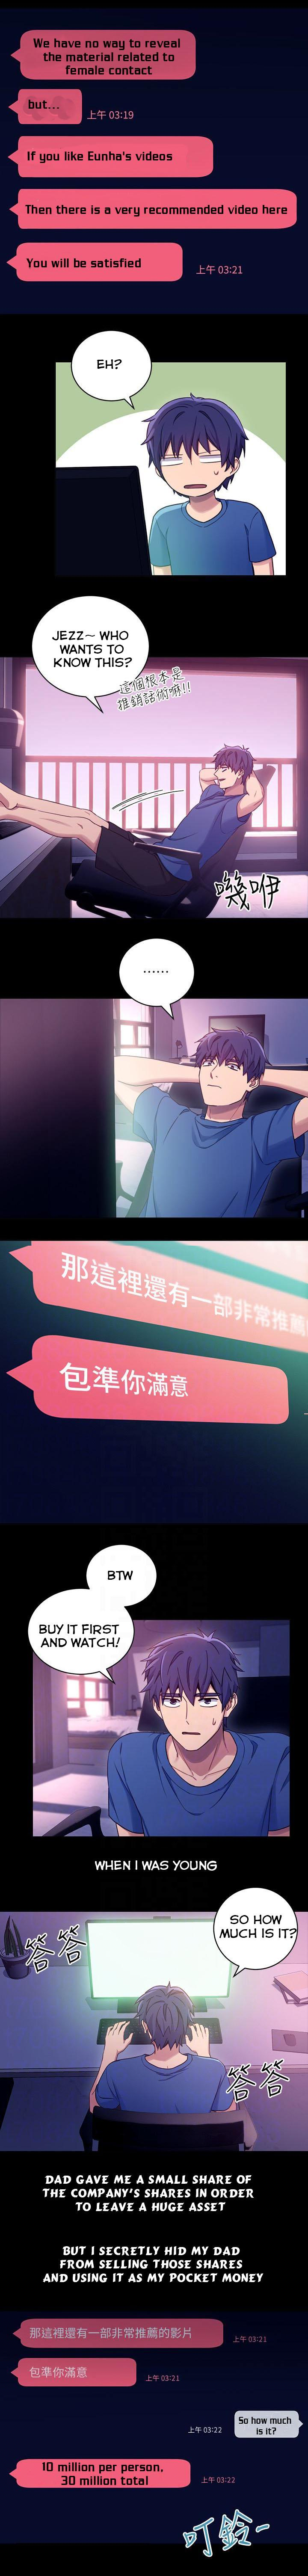 [Neck Pilllow] Stepmother Friends Ch.39/? [English] [Hentai Universe] NEW! 13/10/2020 85